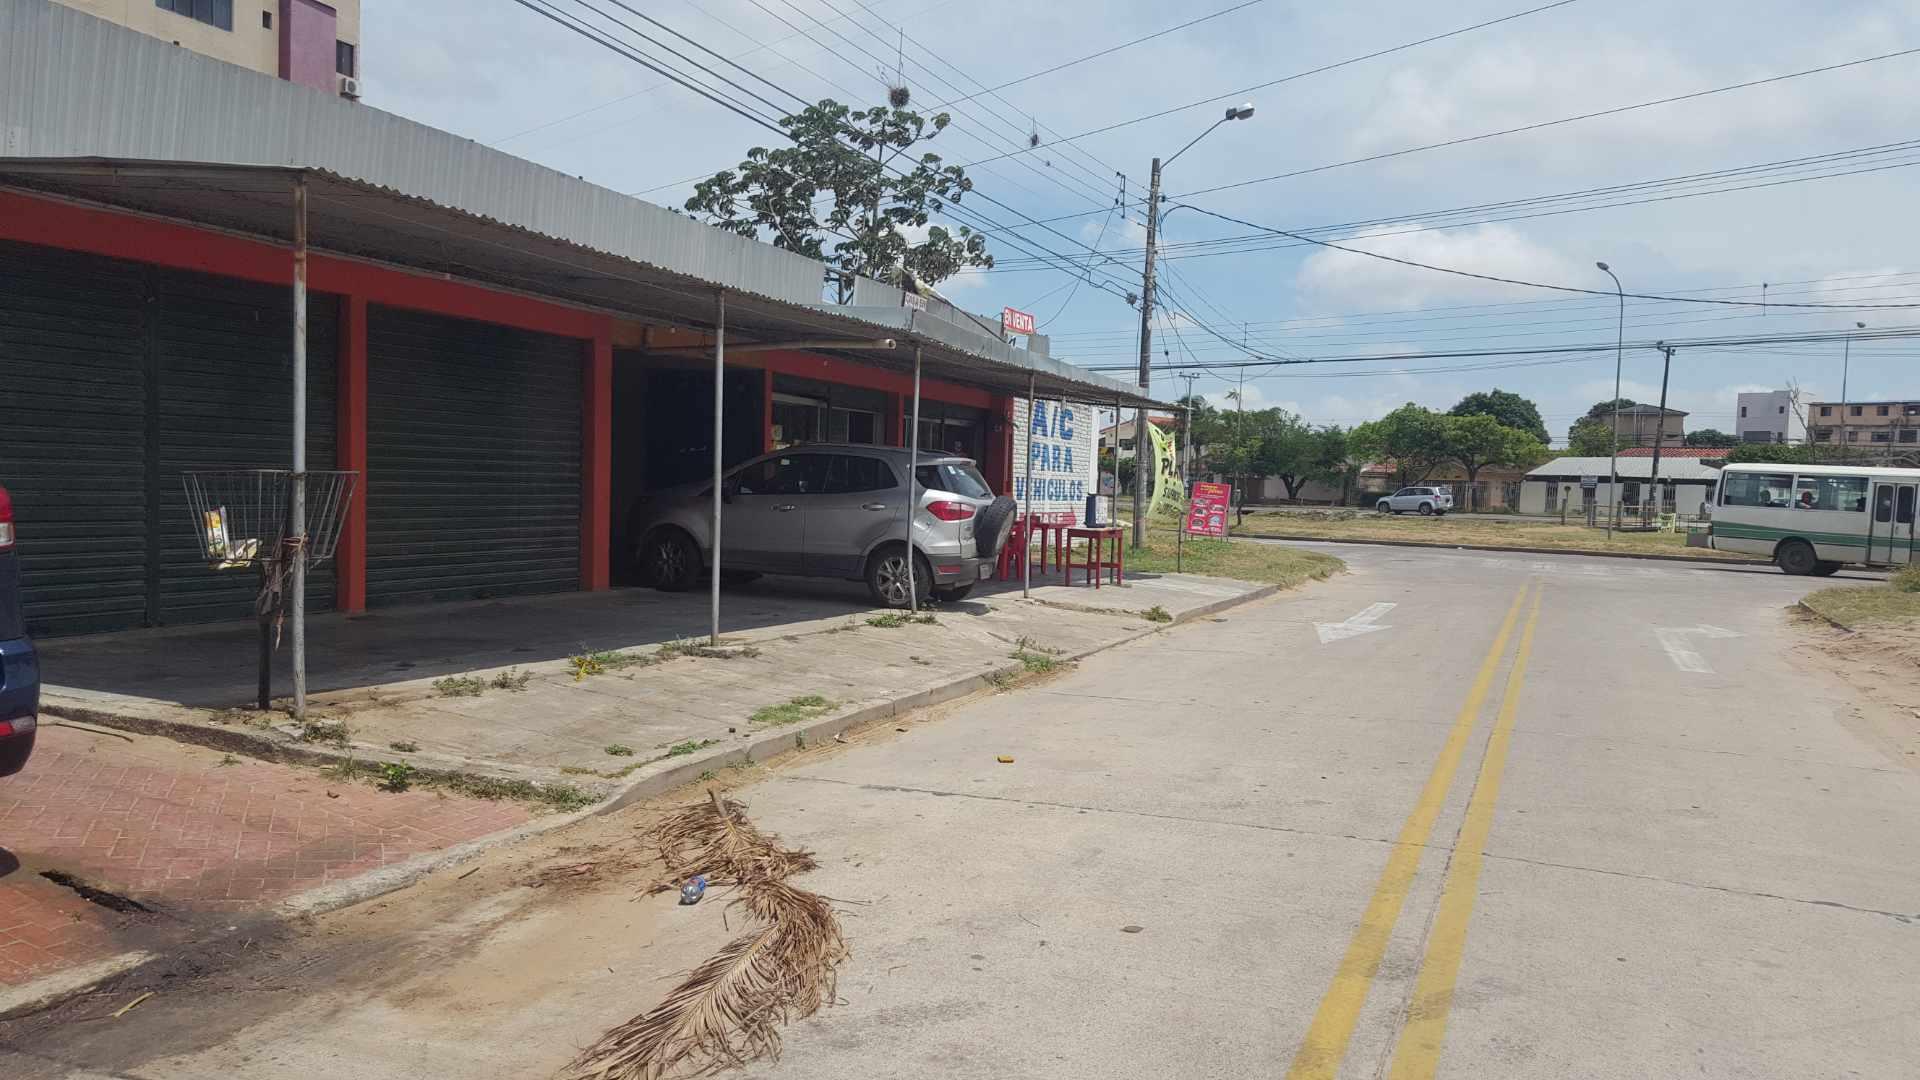 Local comercial en Venta Av. Rolando de Chazal a 10 mts del 4to anillo, amplia avenida pavimentada entre Brasil y Virgen de Cotoca Foto 2